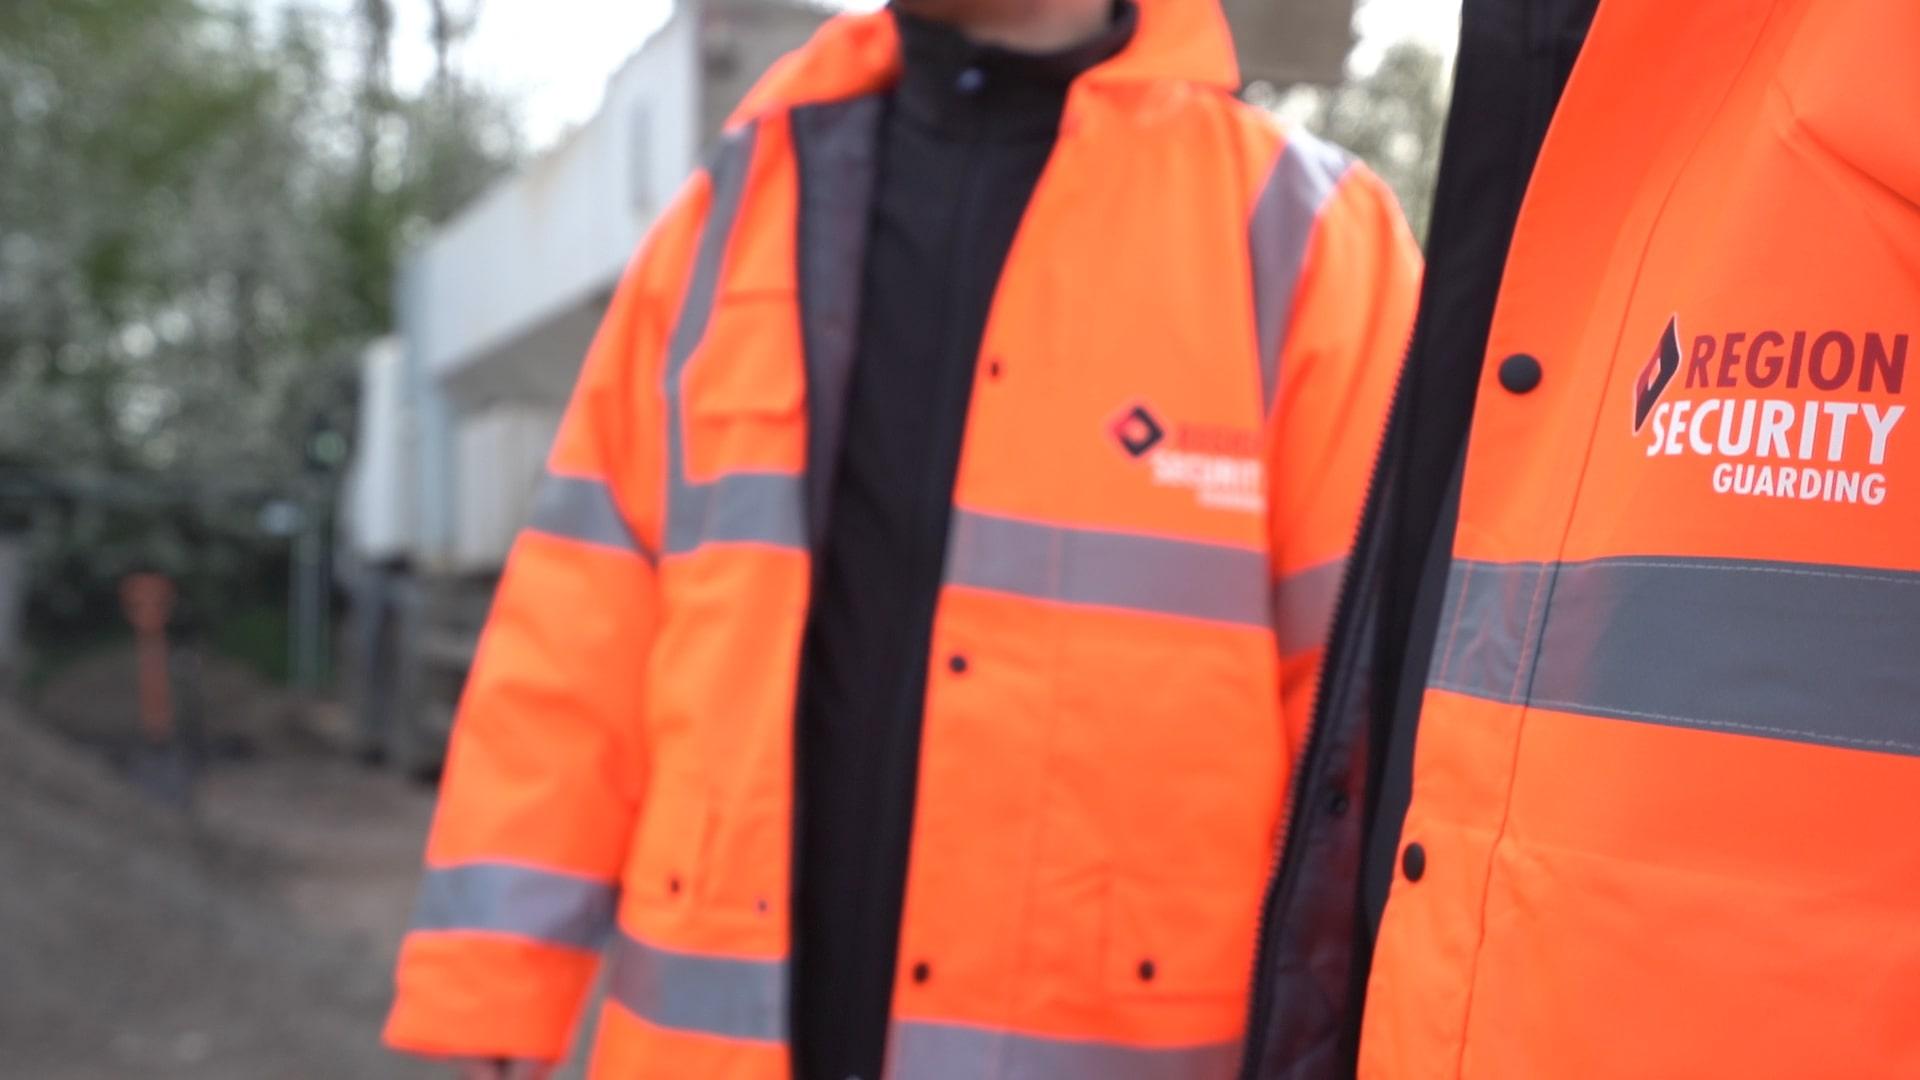 west-london-security-services